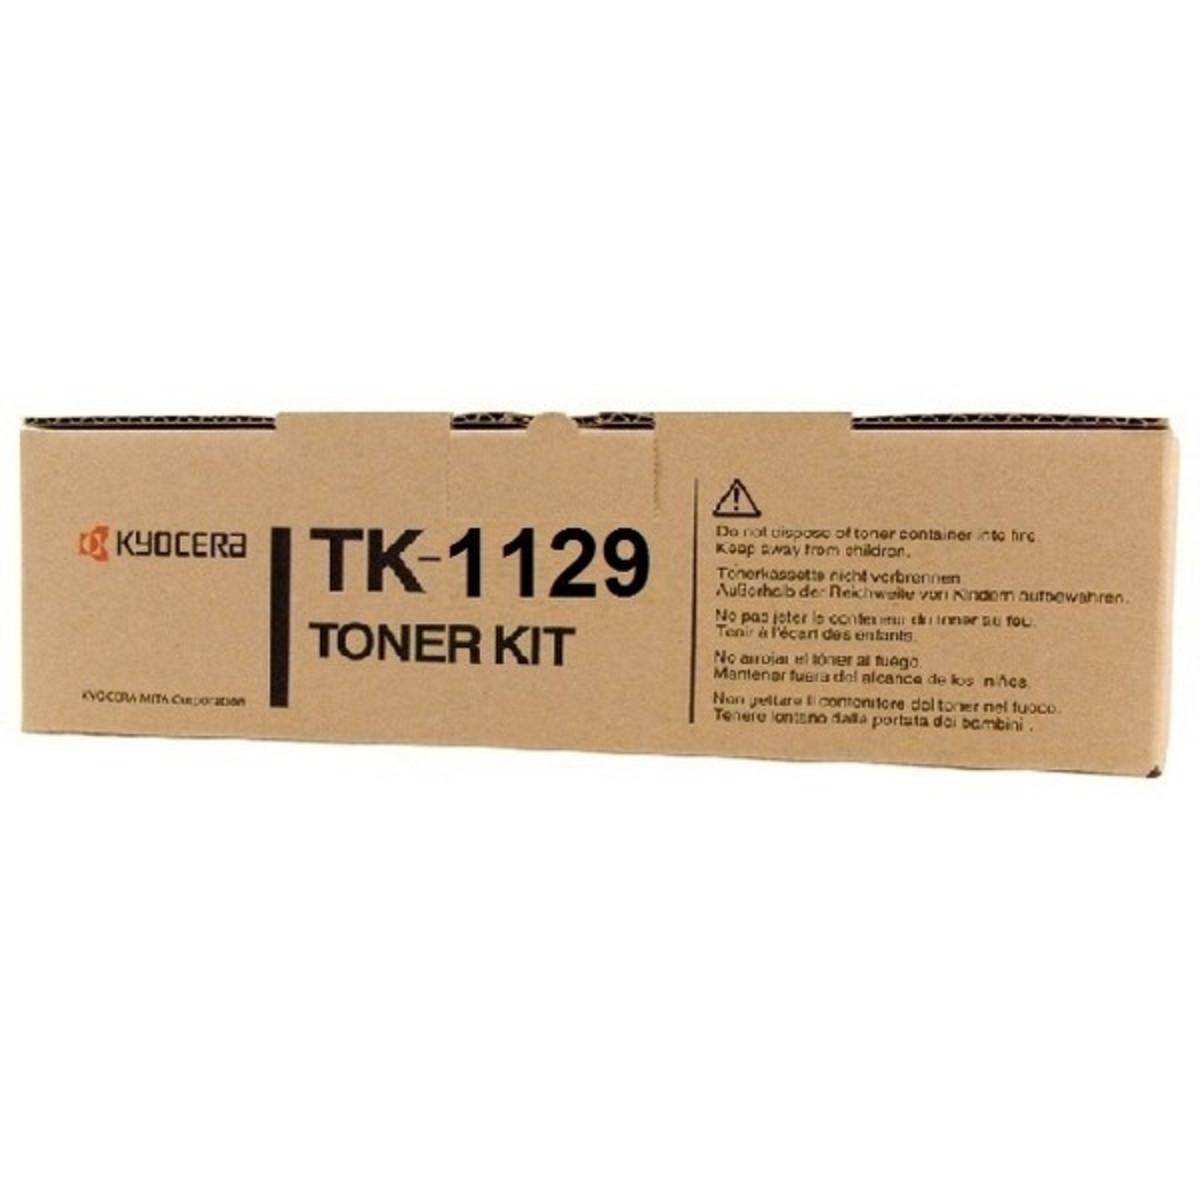 Kyocera TK-1129 Black Toner Cartridge